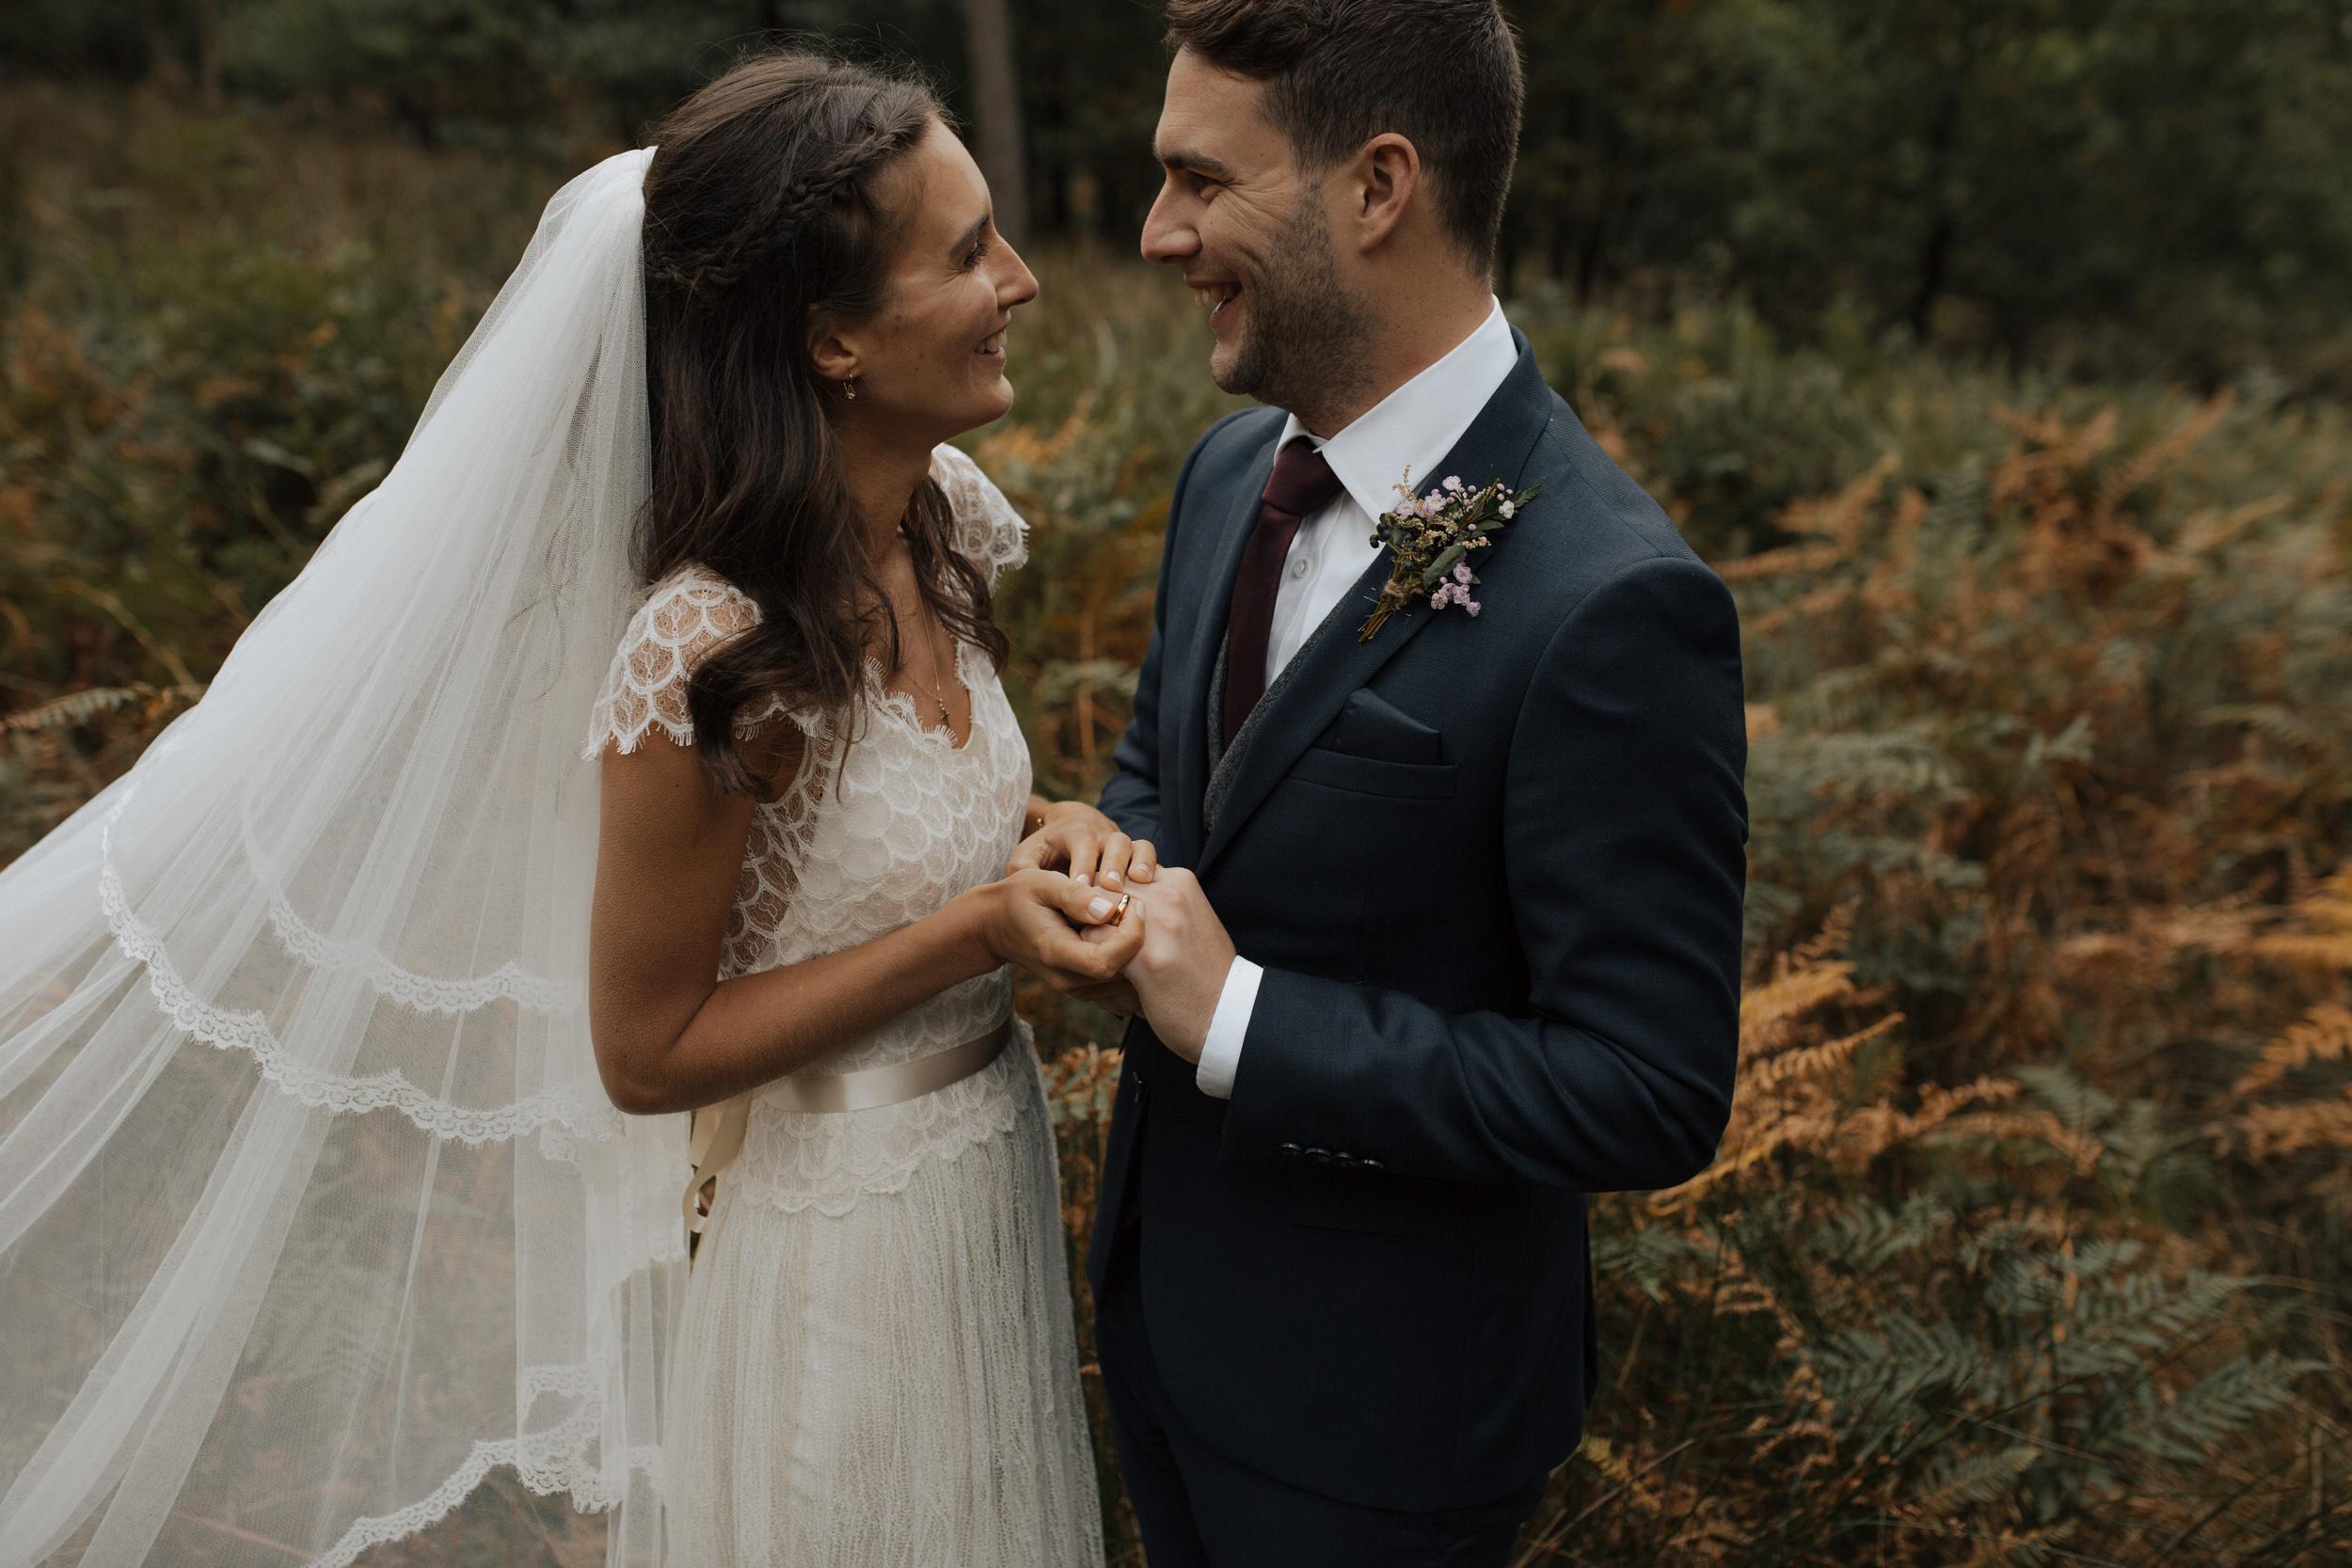 Joasia-Kate-Beaumont-Bohemian-Lace-Wedding-Dress-Peak-District-Sheffield-Wedding-35.jpg